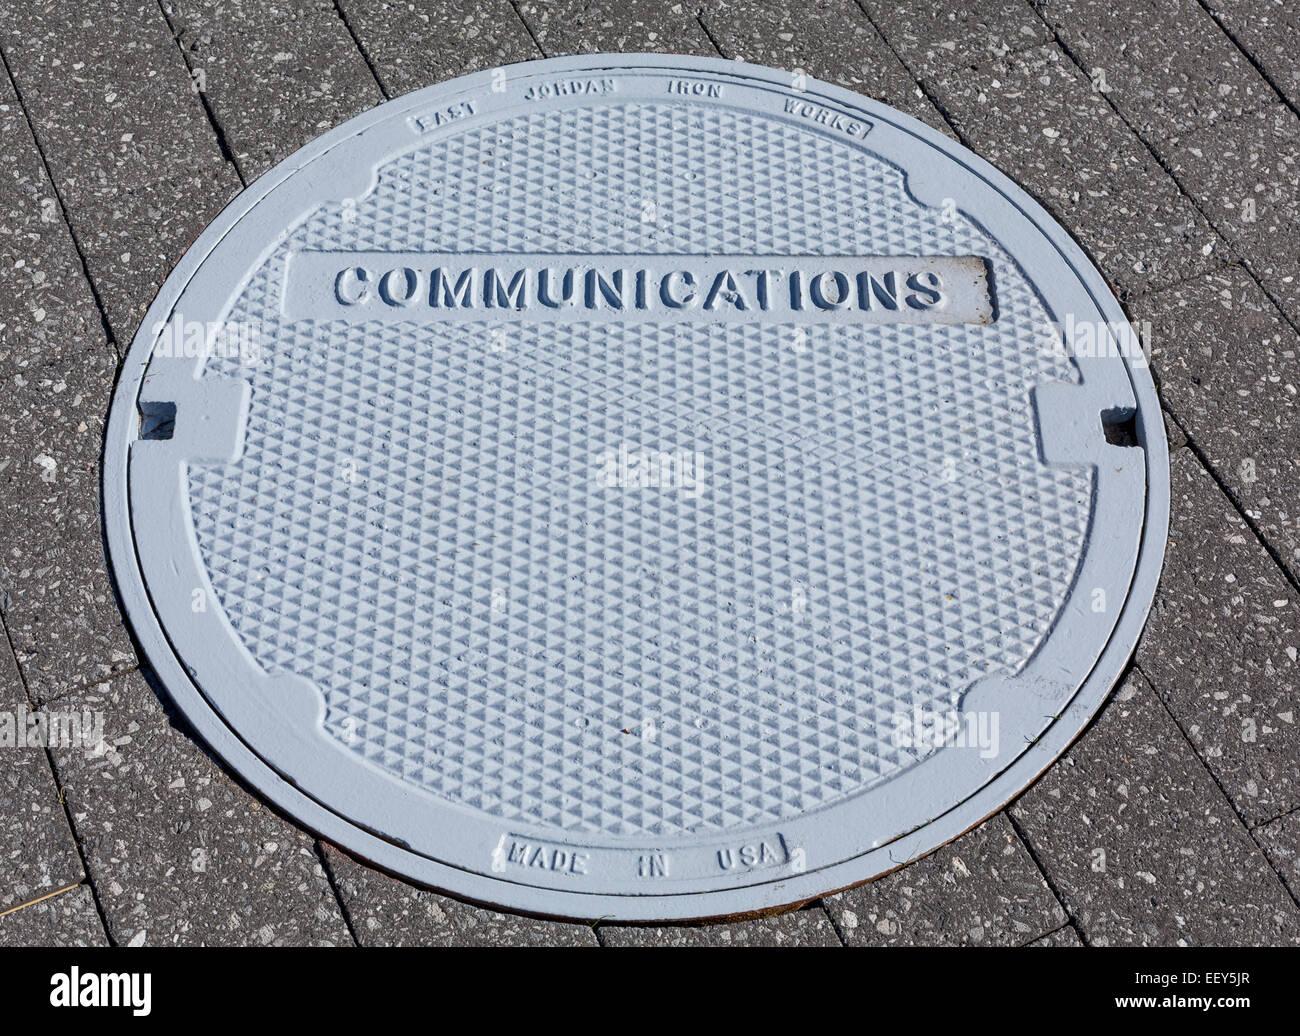 Tapa de registro de comunicaciones en un pavimento - concepto de comunicación Imagen De Stock